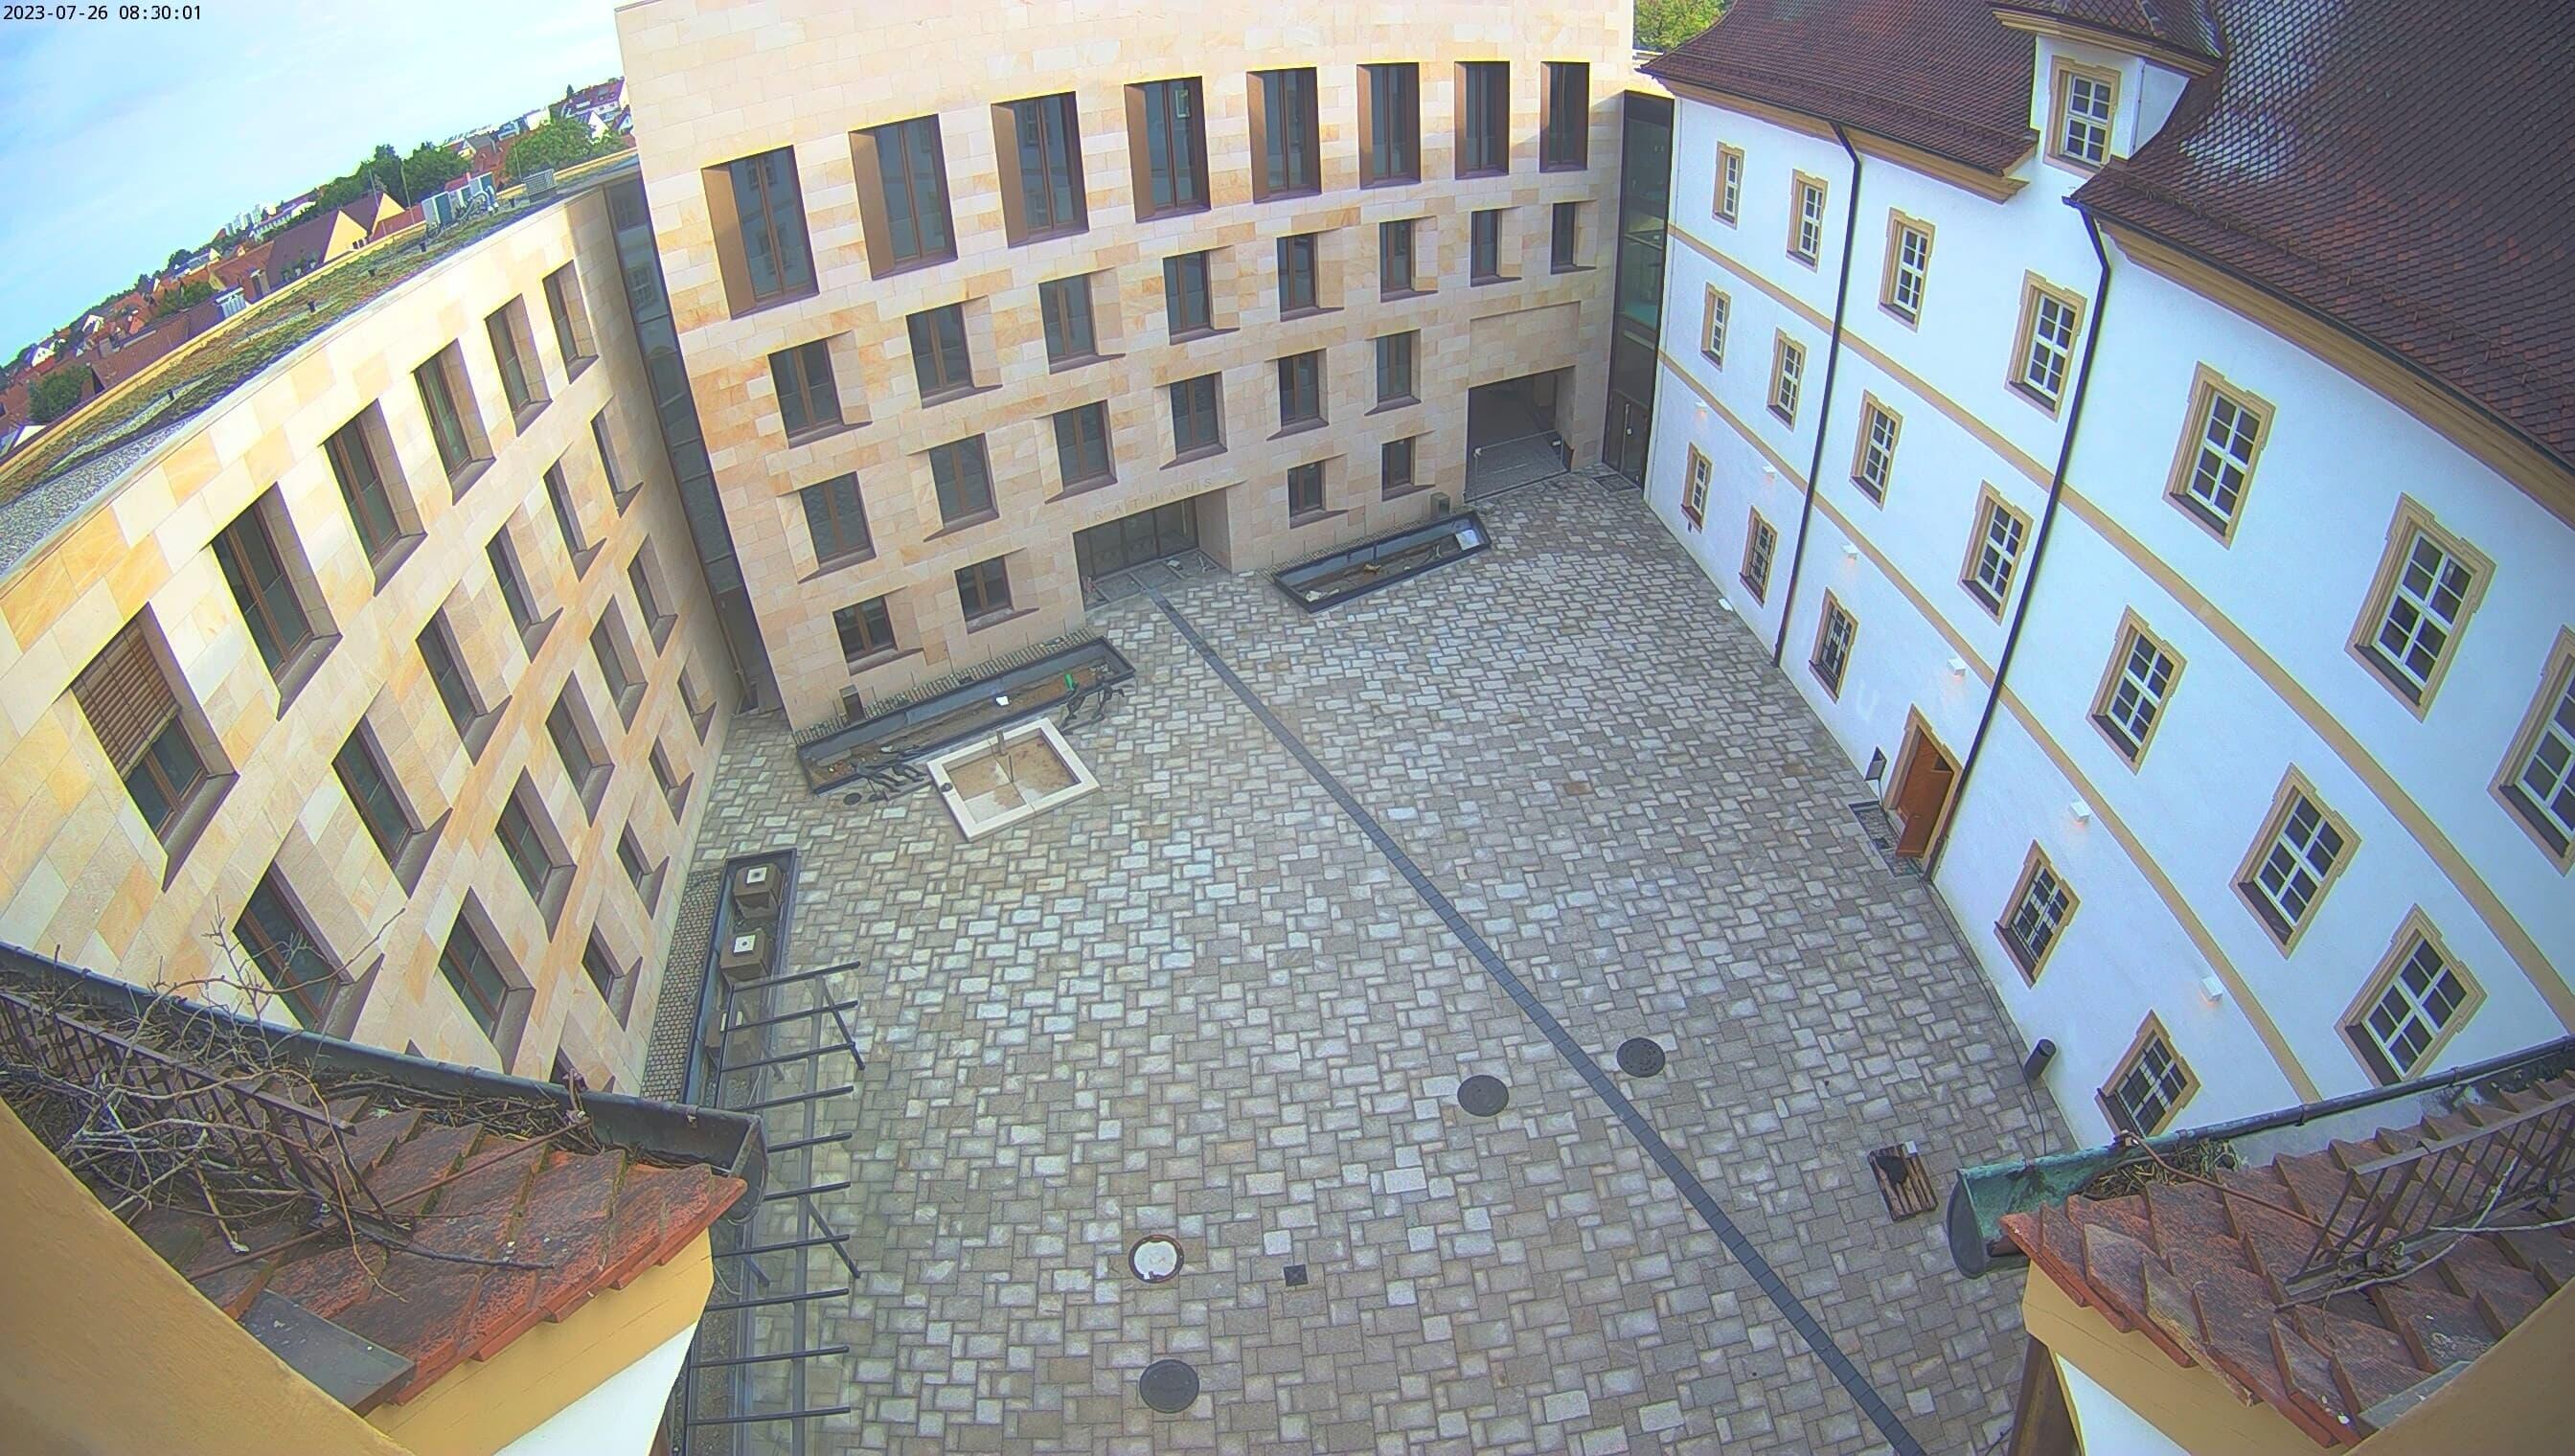 Webcam im Schloss Innenhof Herzogenaurach